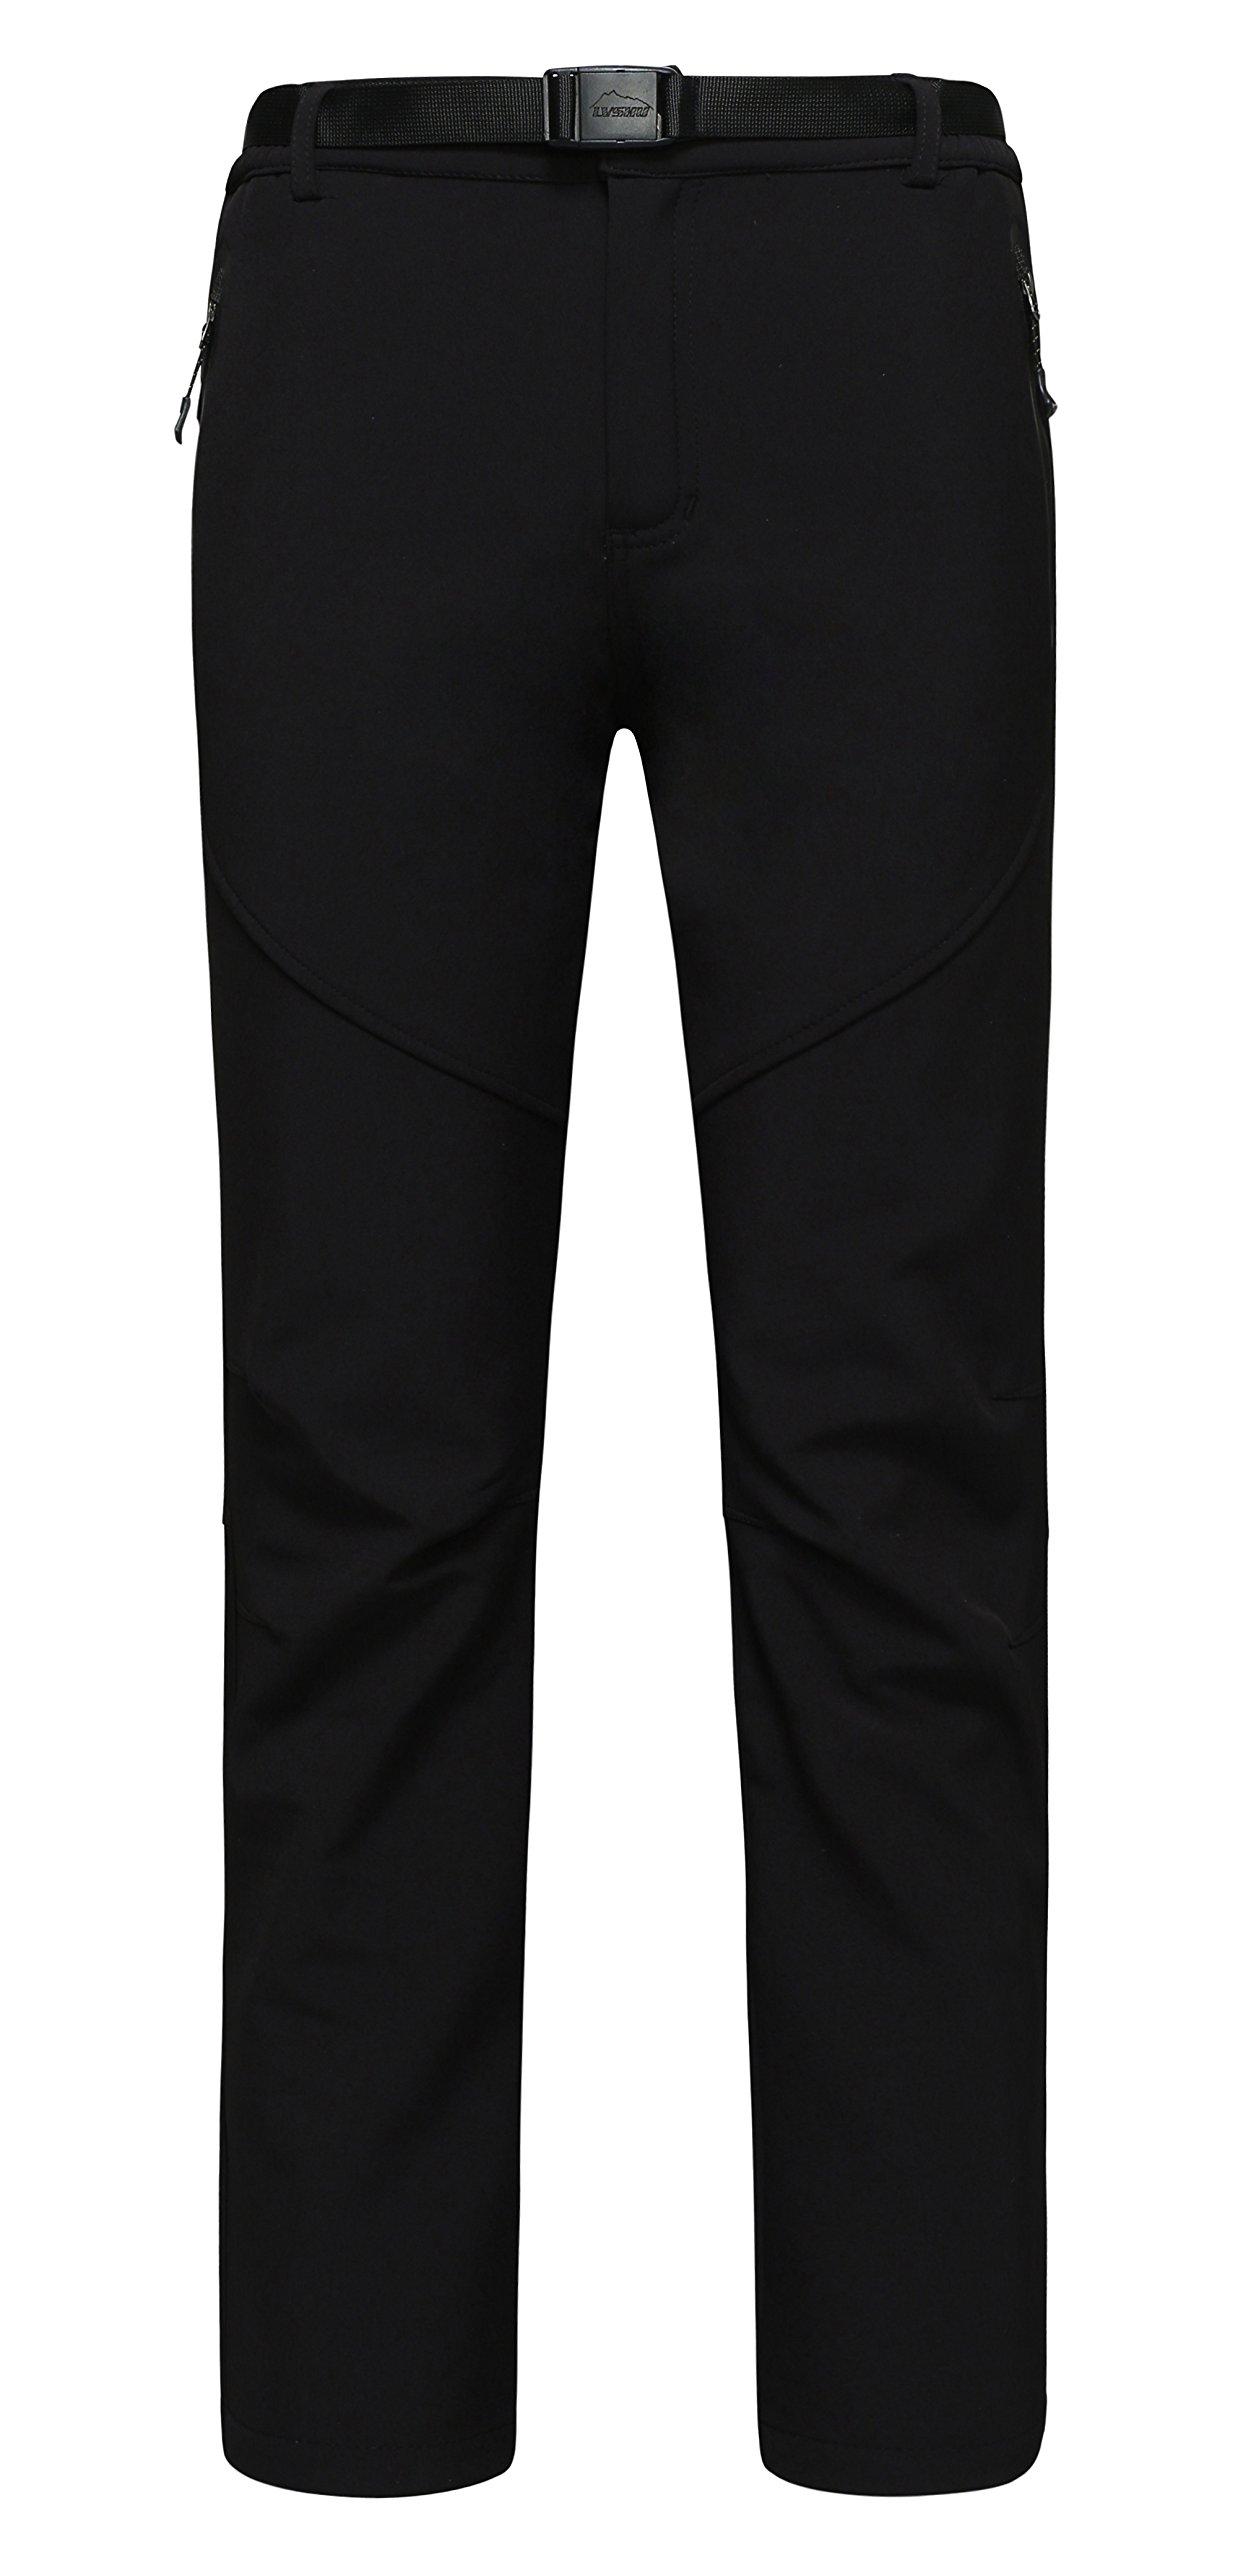 Diamond Candy Men\'s Outdoor Lightweight Waterproof Hiking Mountain Pants Black-XL